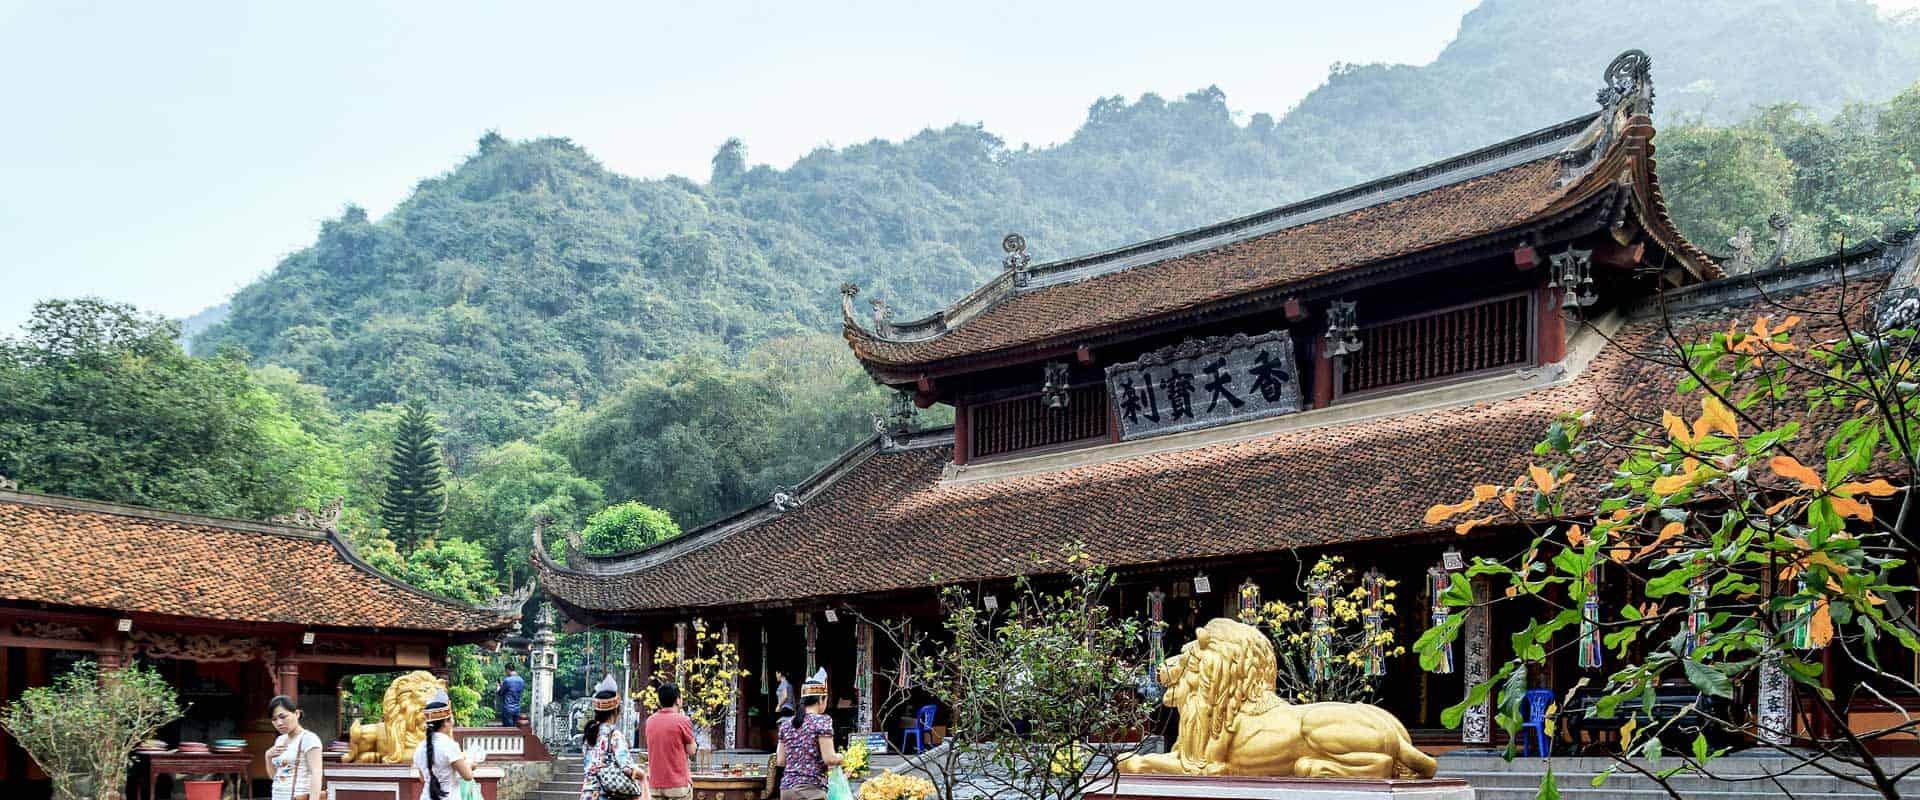 la pagode des parfums